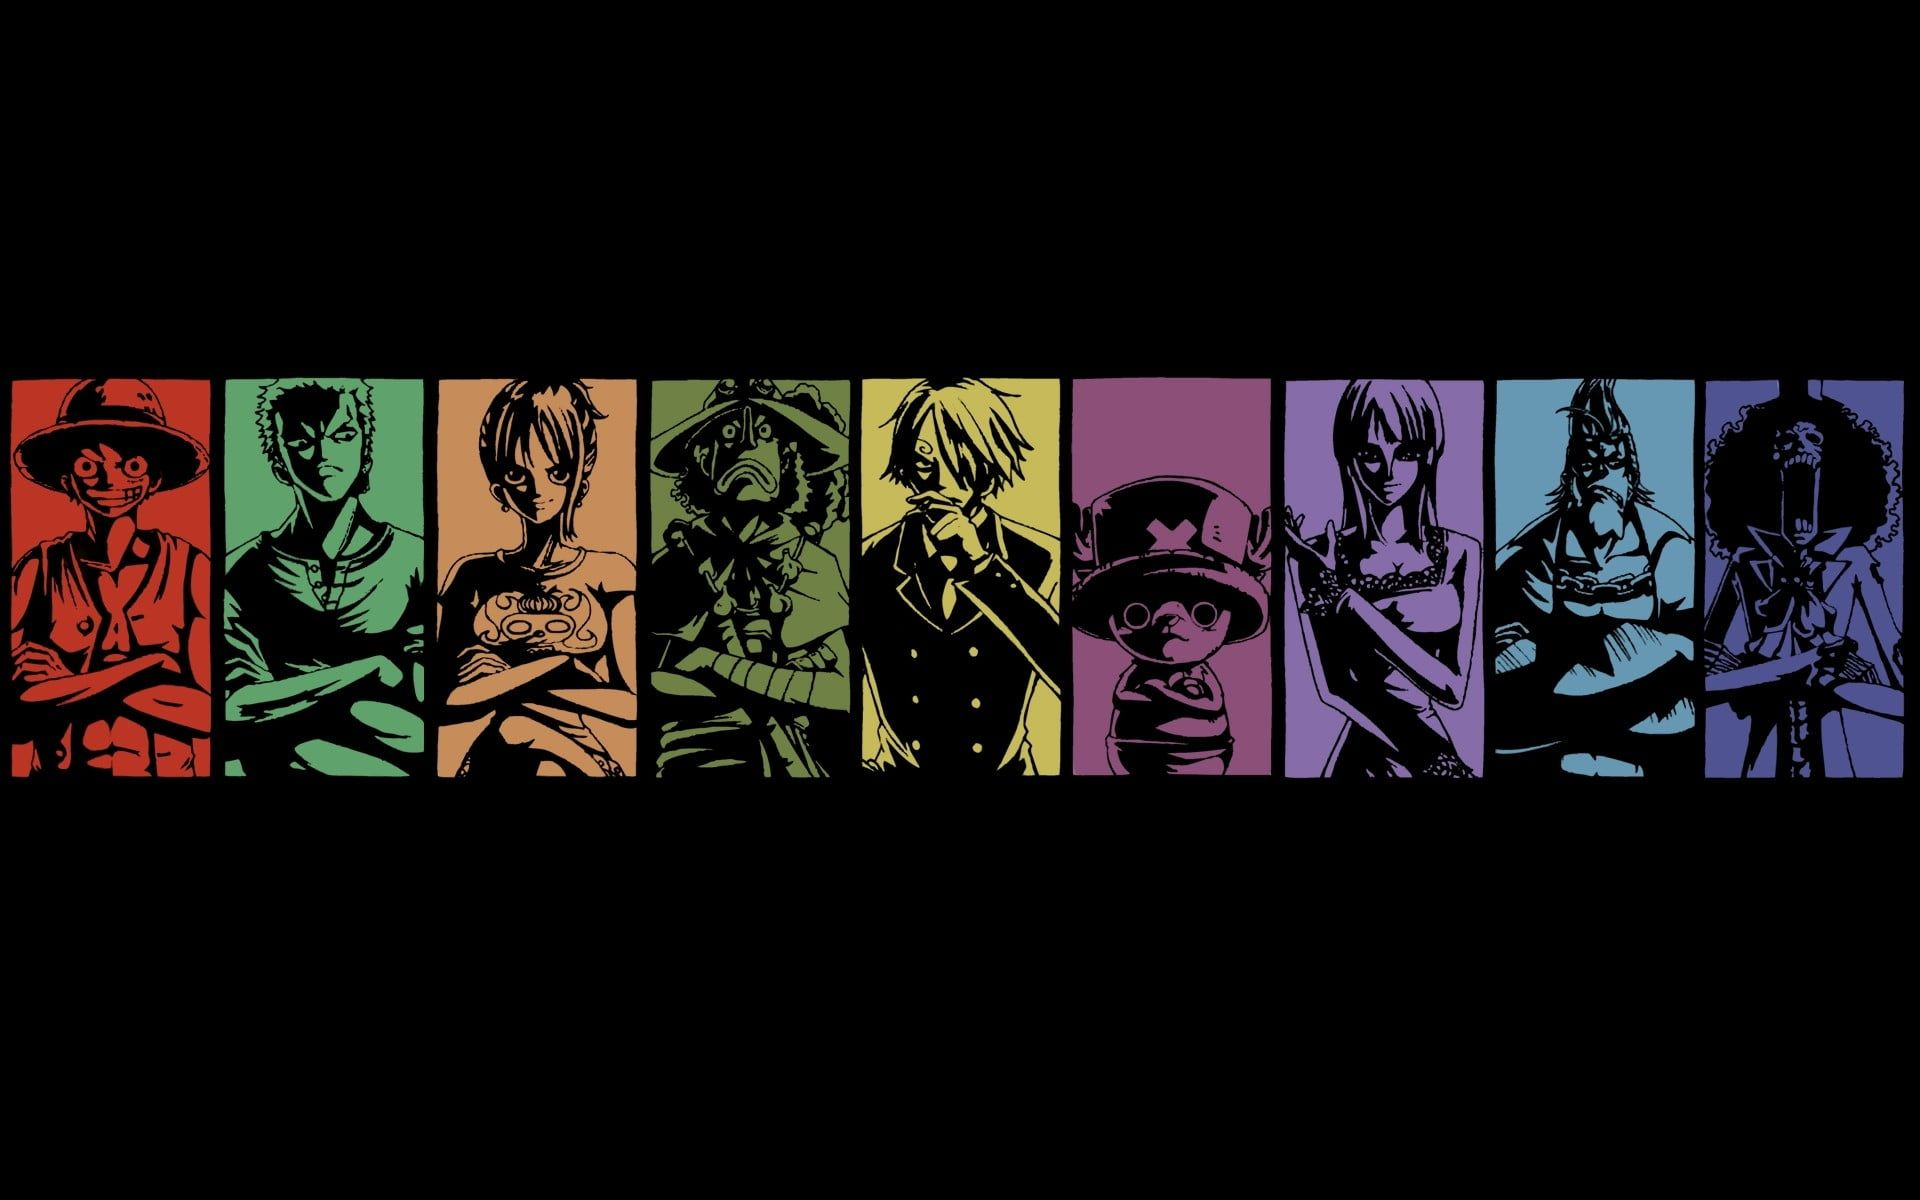 One Piece Characters Wallpaper Screenshot One Piece Panels Collage Anime 1080p Wallpaper Hdwallpape Anime Wallpaper One Piece Anime Manga Anime One Piece Anime collage wallpaper hd